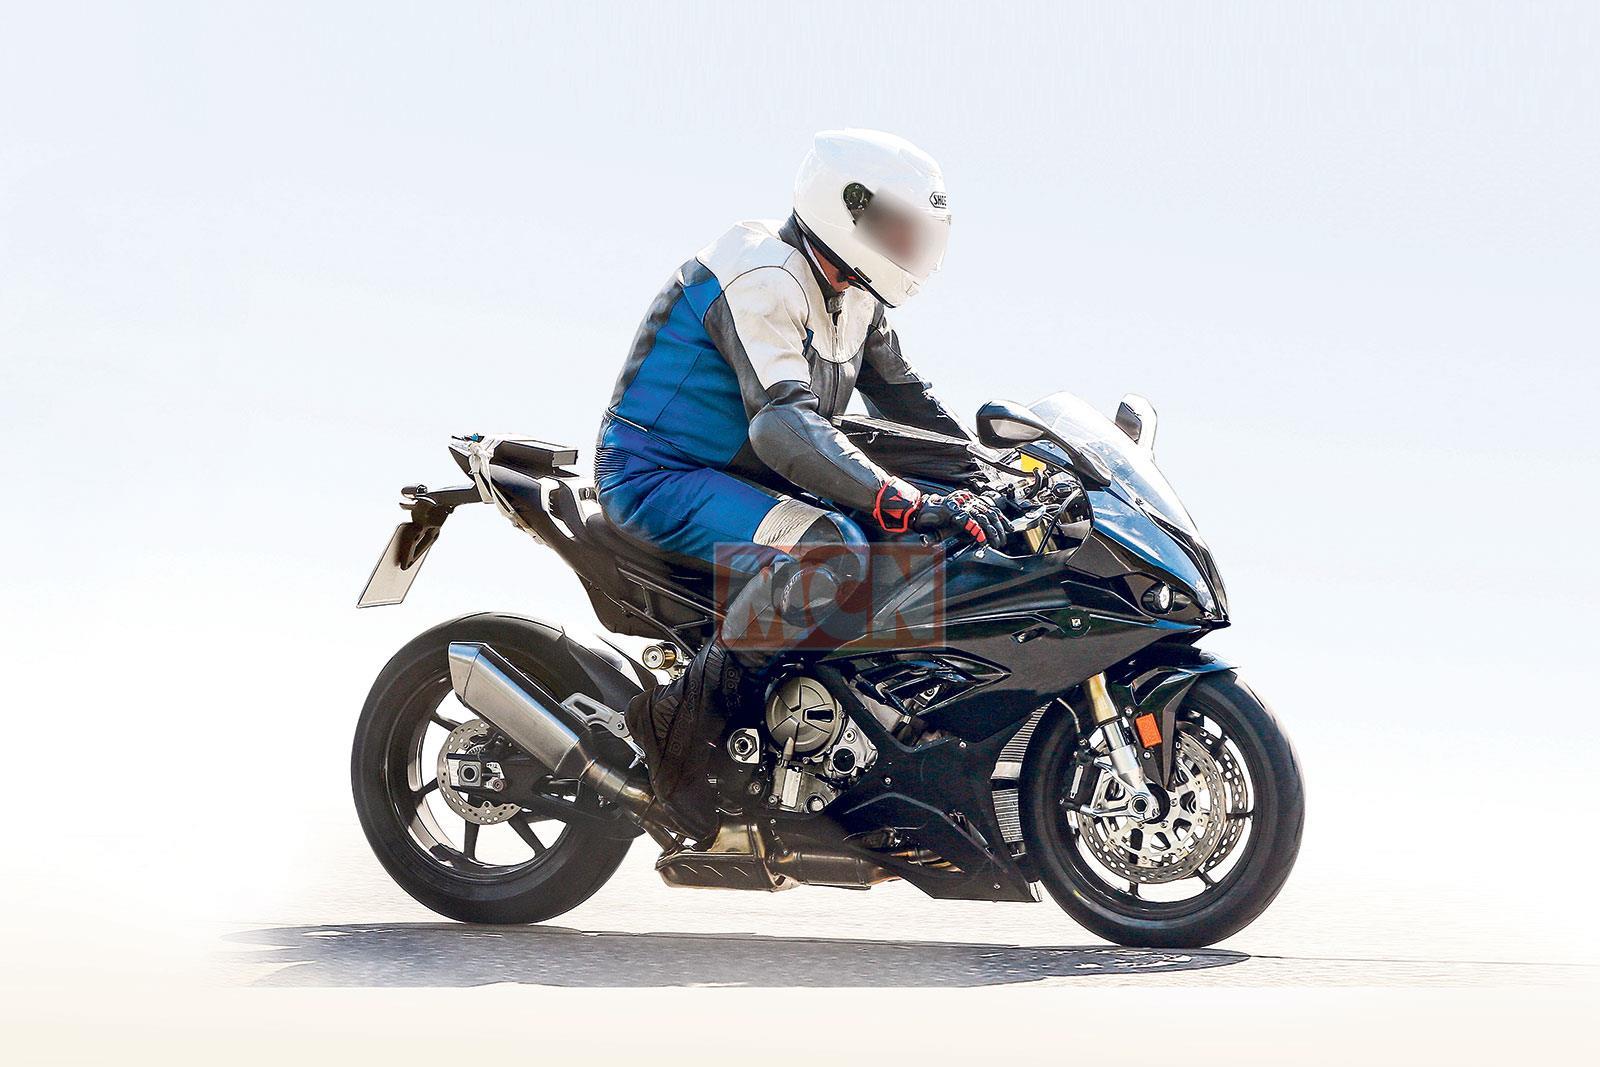 BMW's radical new S1000RR